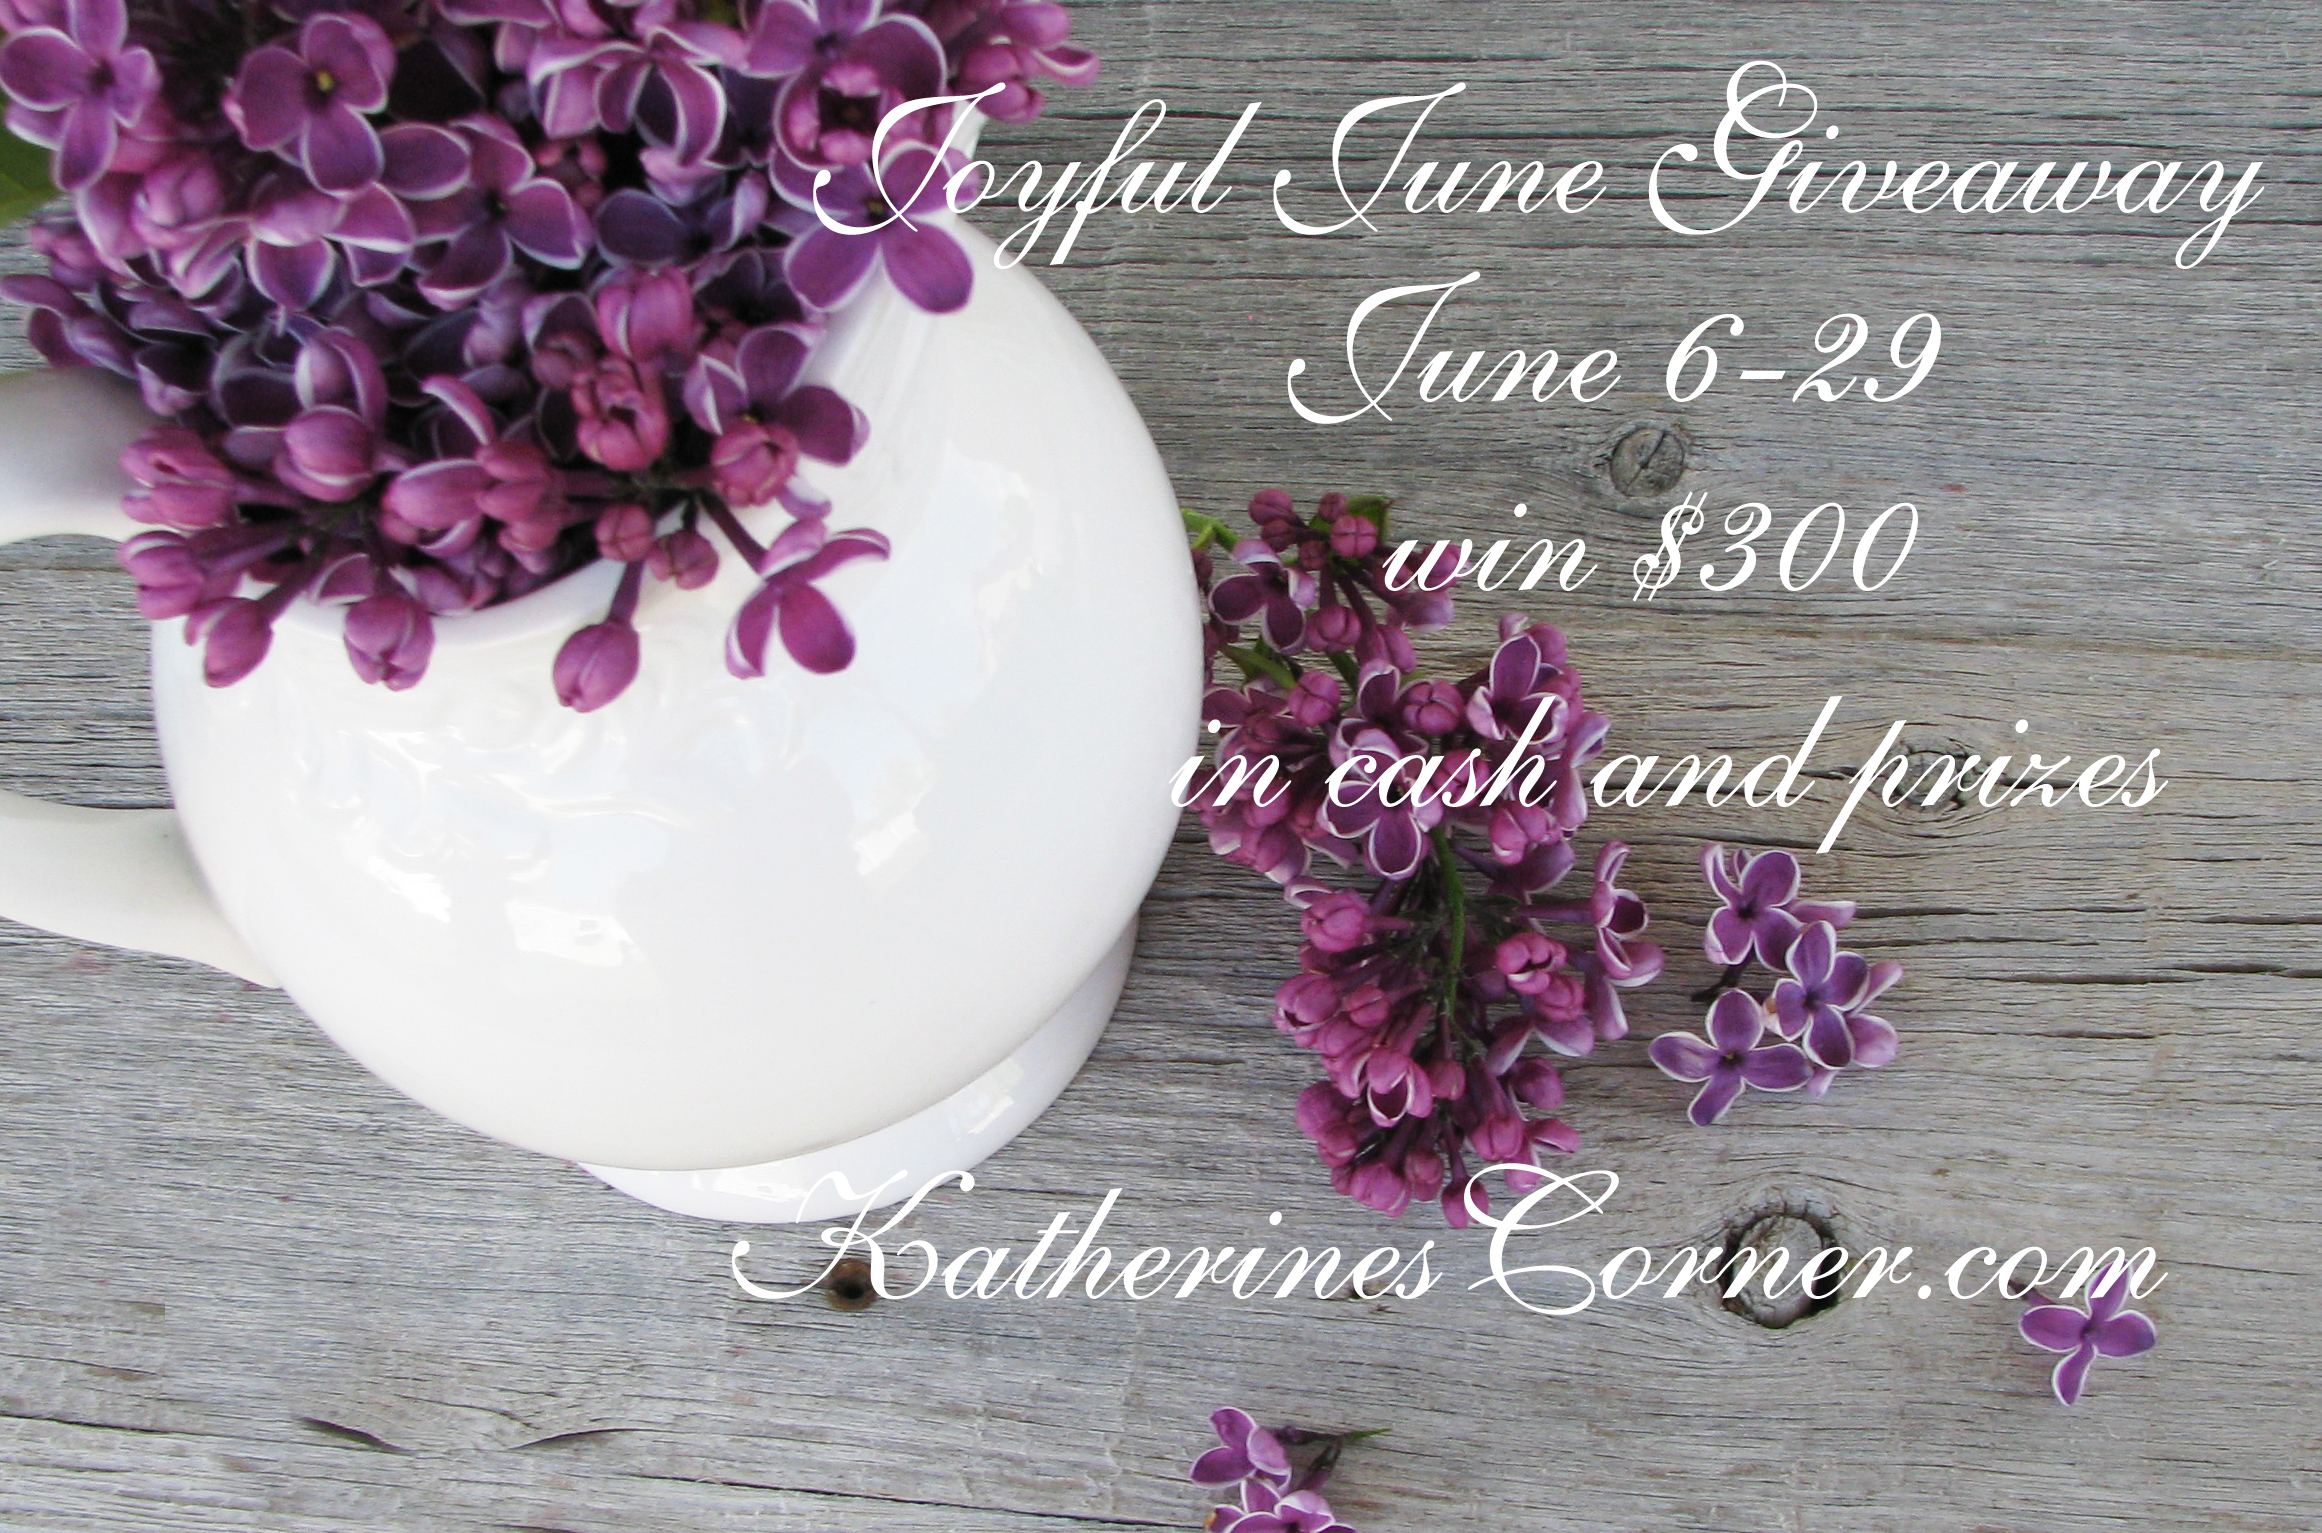 Joyful June Giveaway